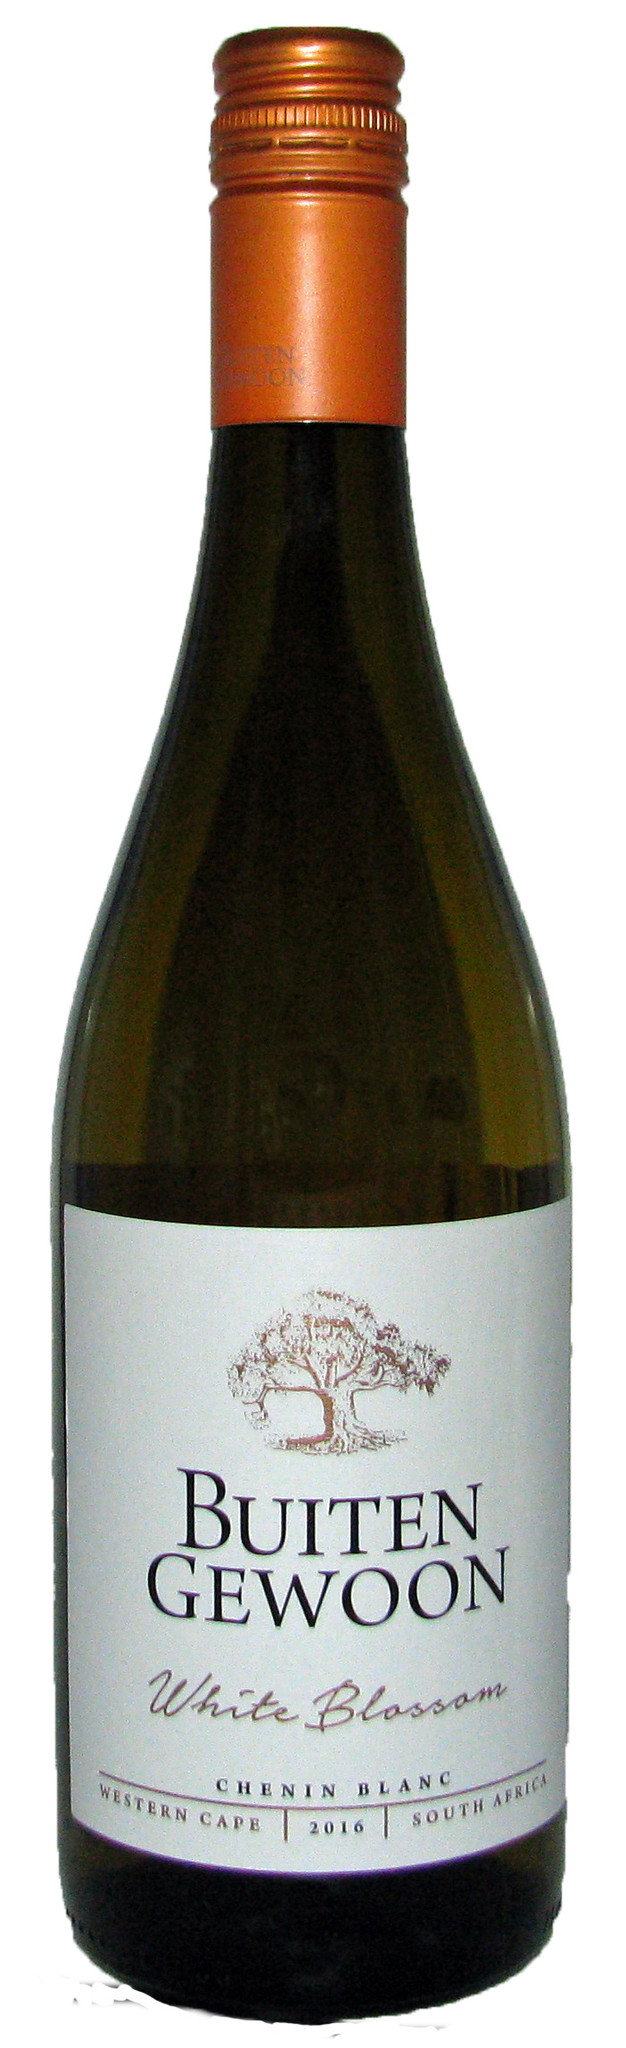 Buitengewoon White Blossom, Chenin Blanc, 2020, Western Cape, Zuid-Afrika, Witte wijn